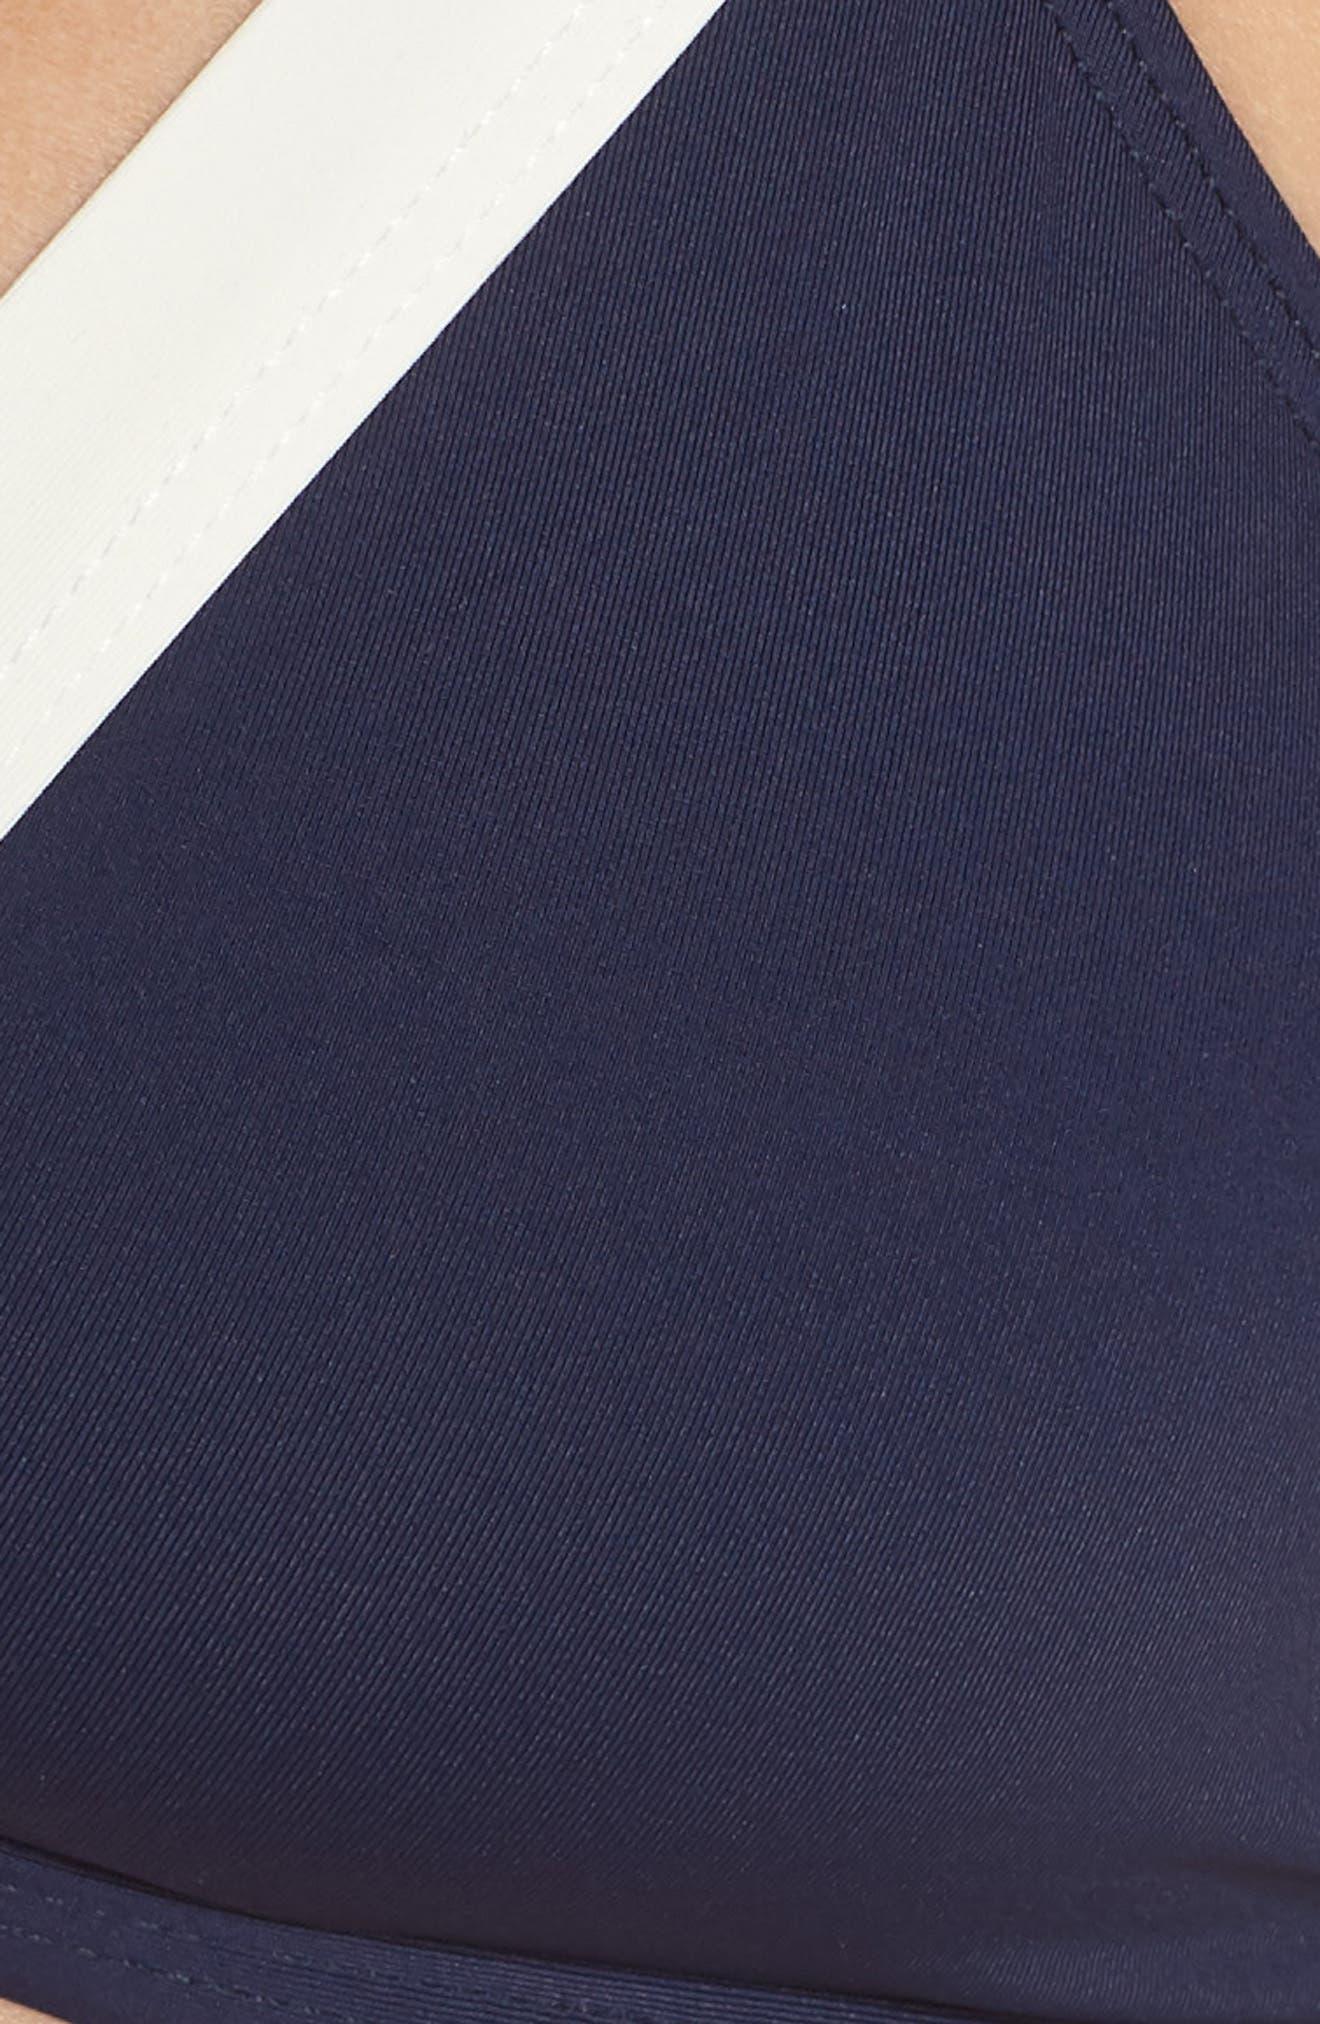 Farrah Bikini Top,                             Alternate thumbnail 5, color,                             401